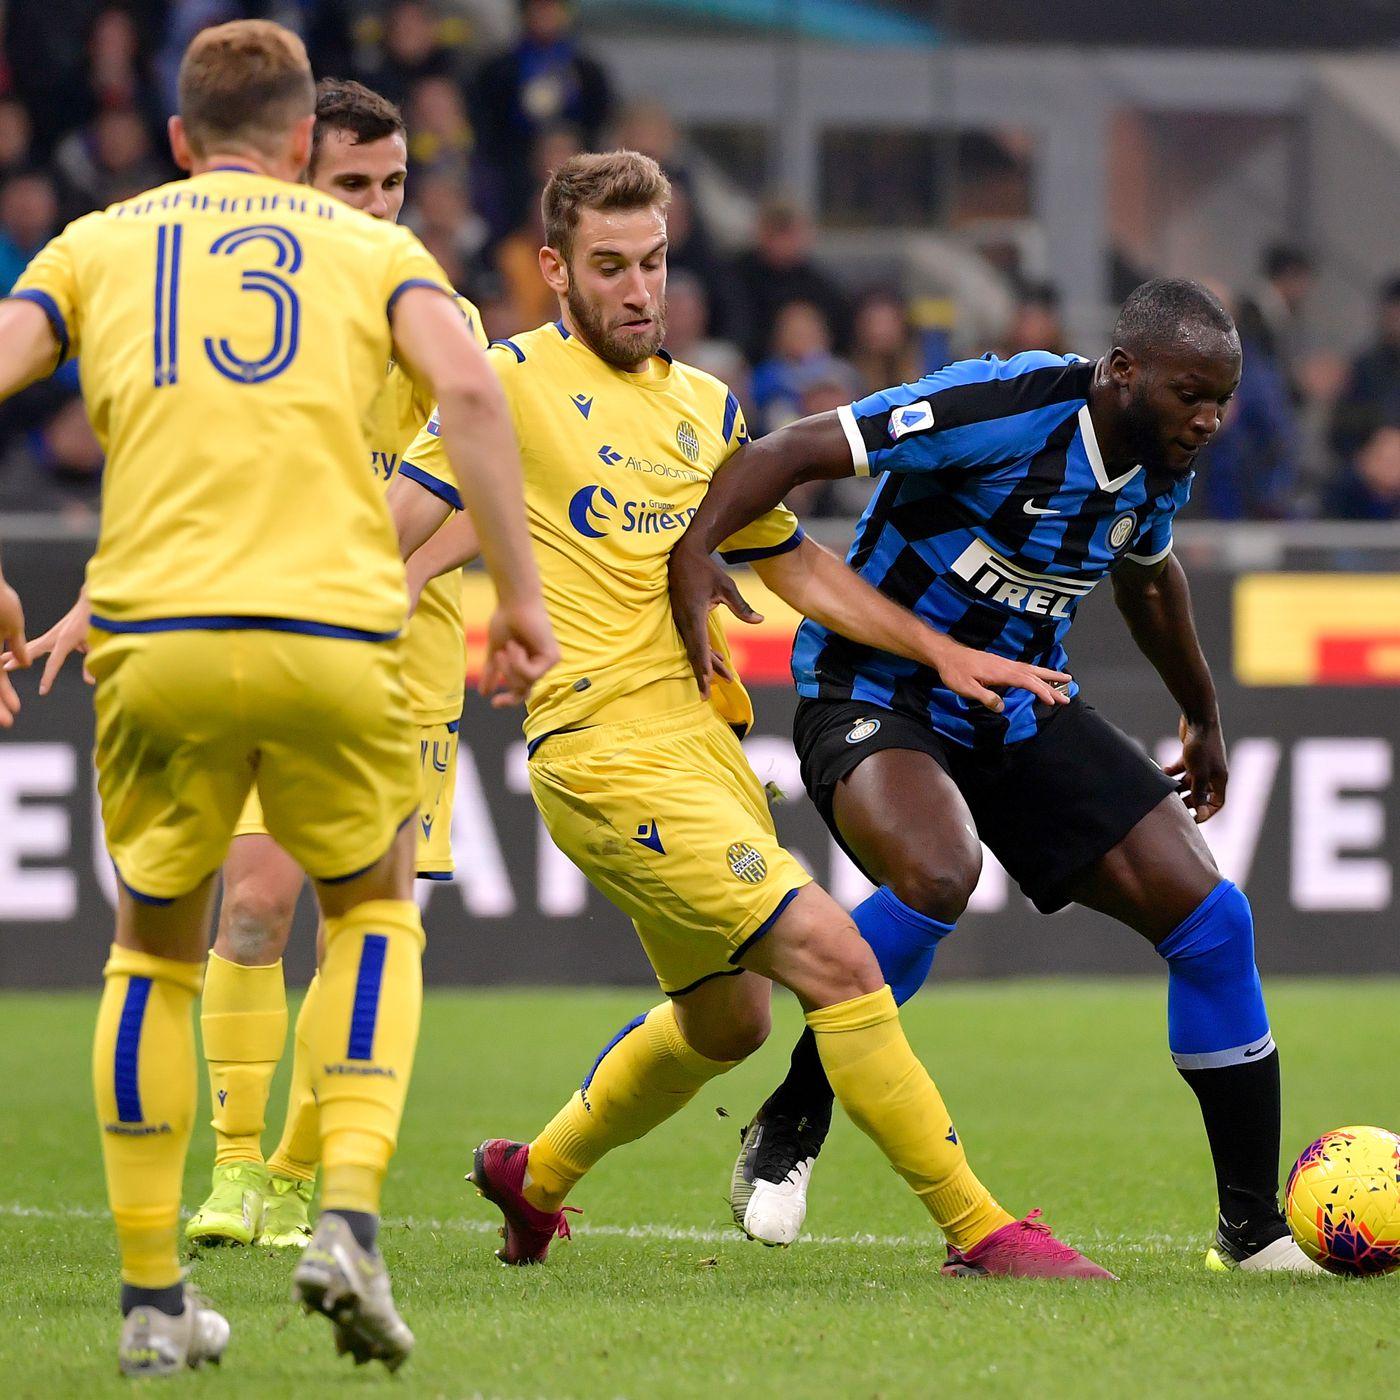 Inter v verona betting preview nfl lori bettinger and jeff francoeur